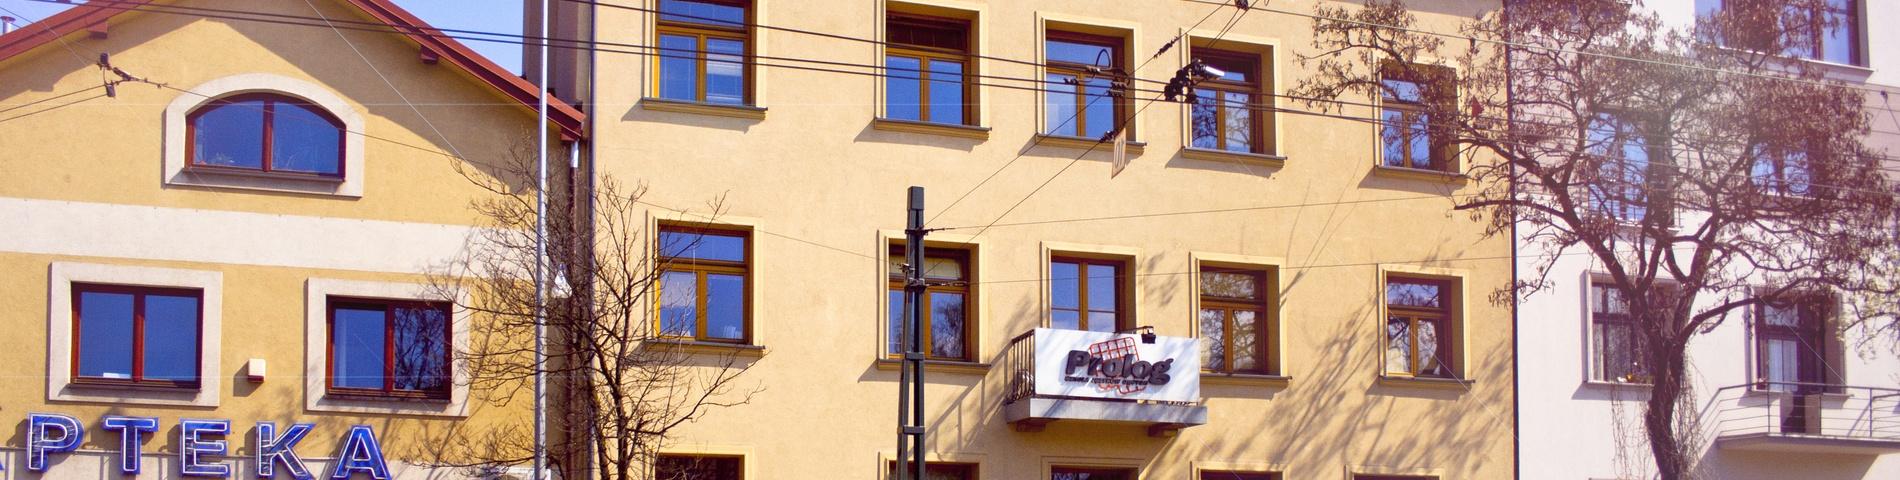 PROLOG School of Polish obrazek 1